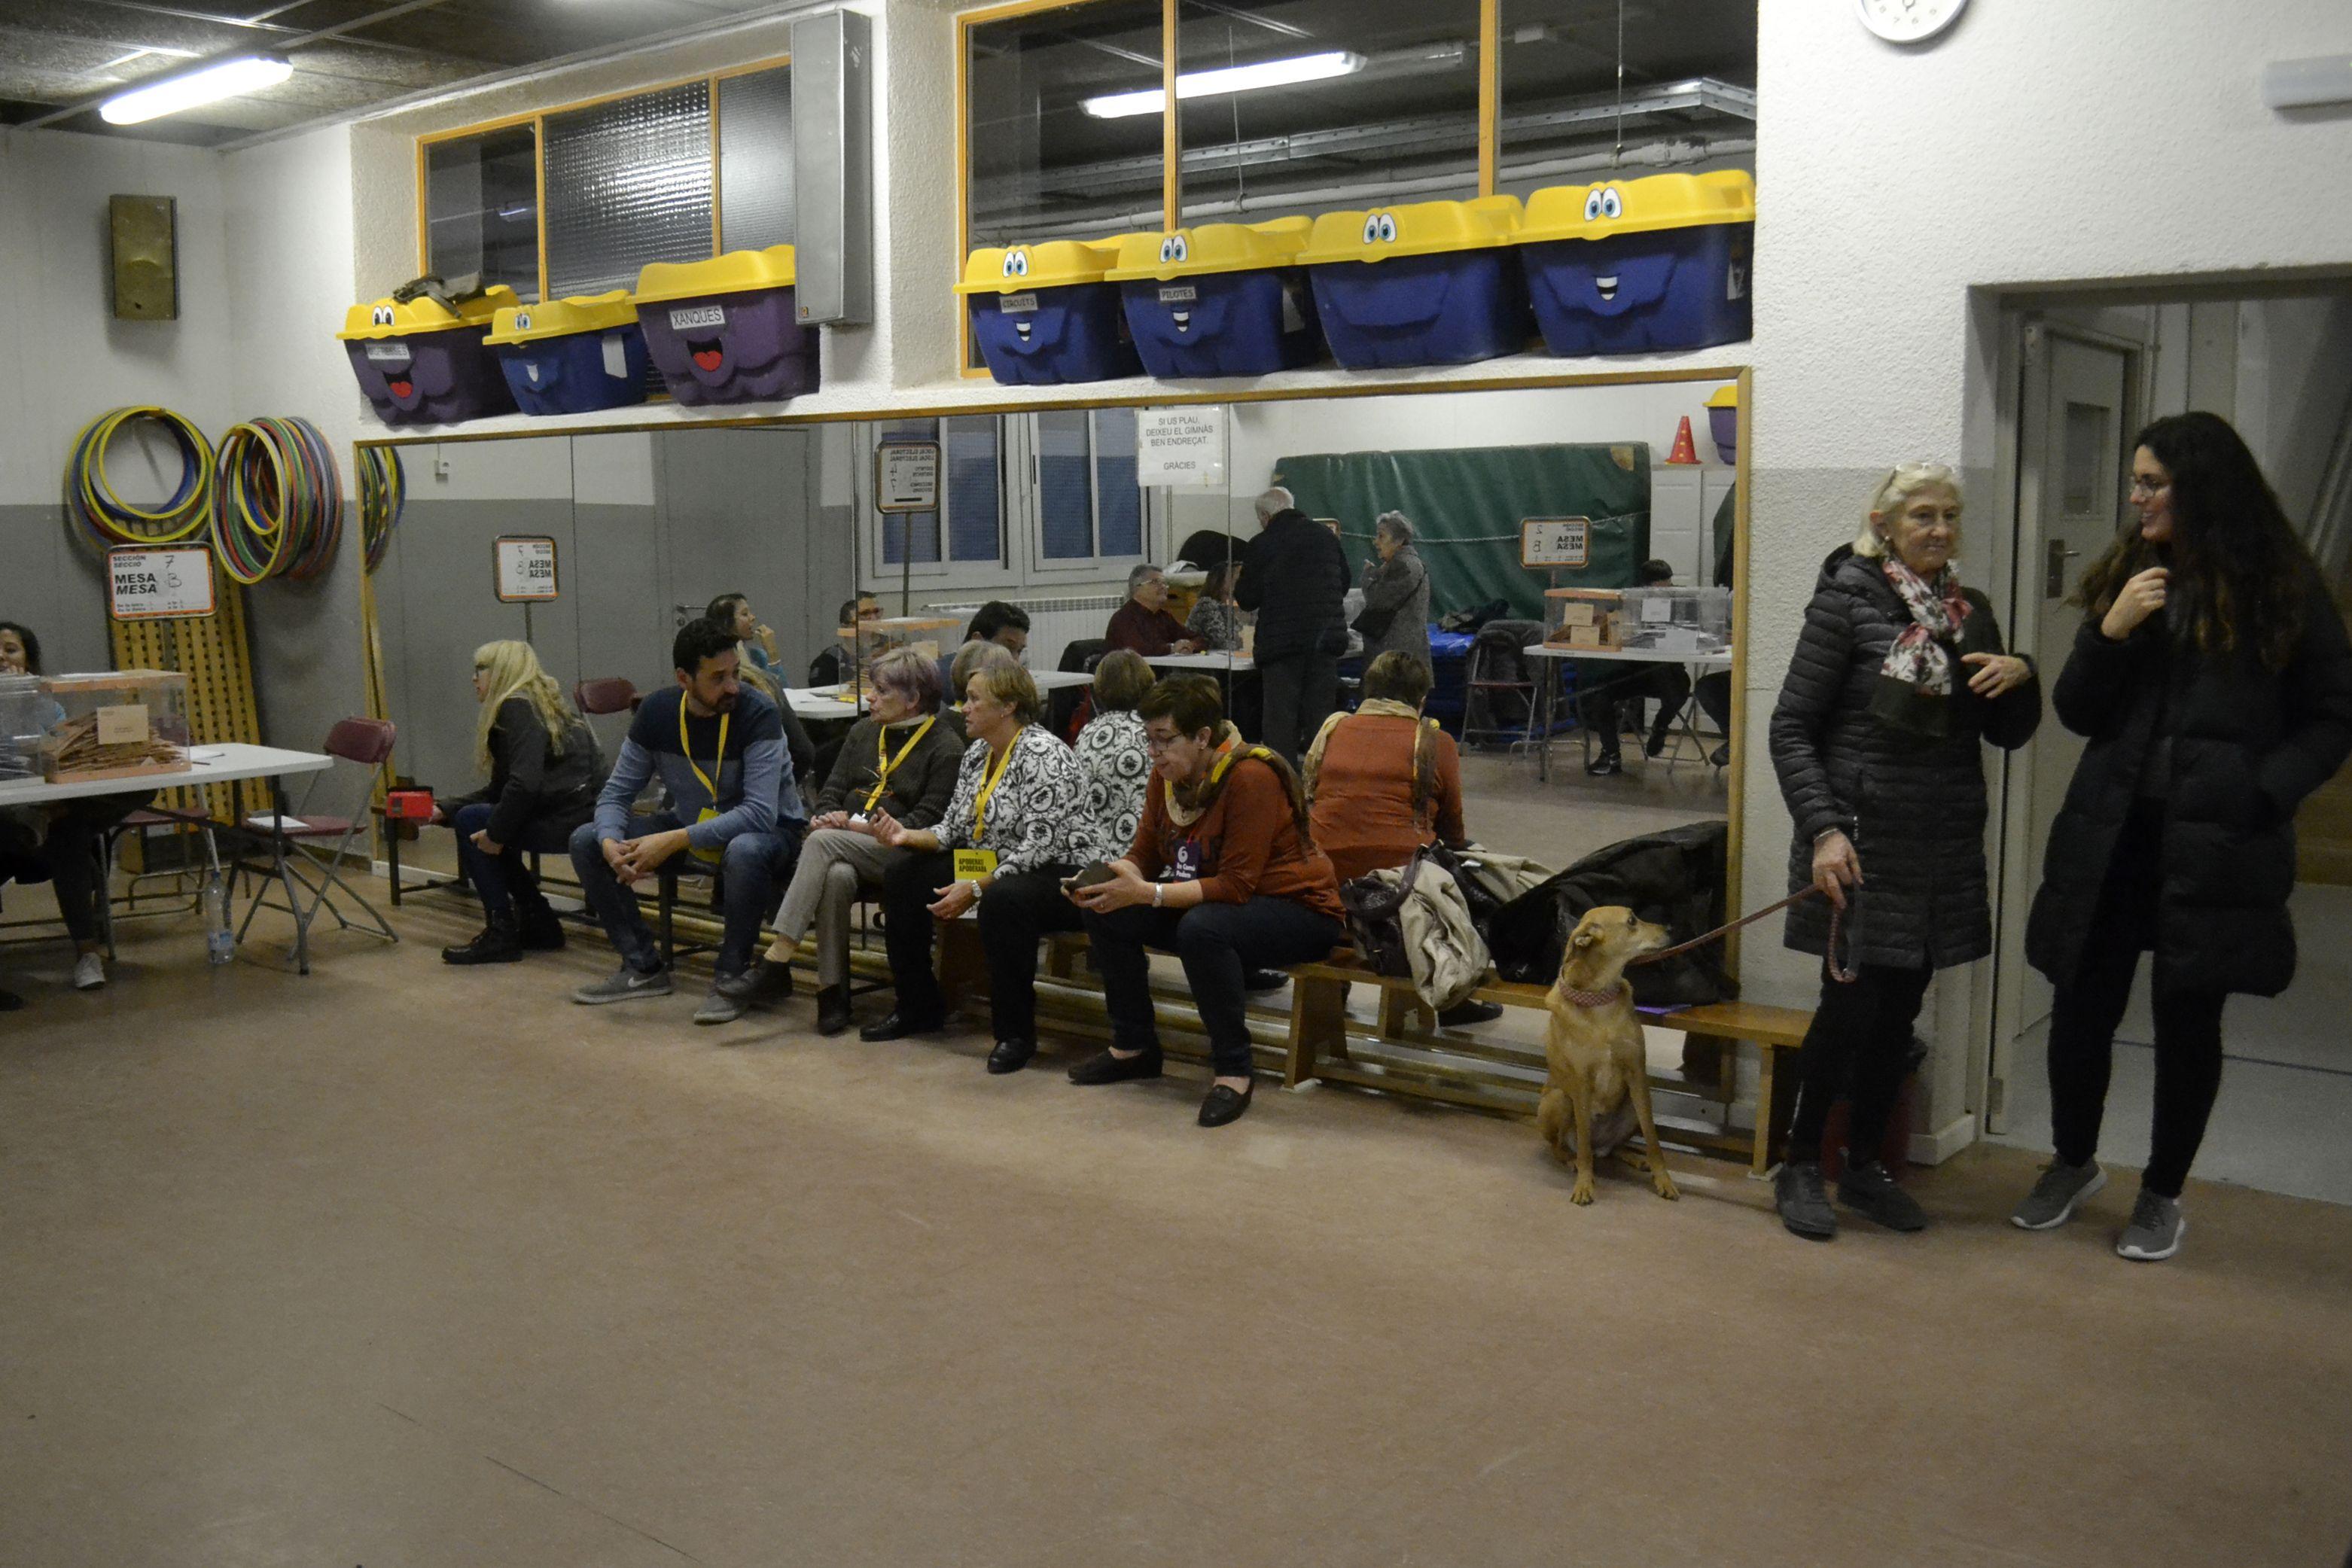 Eleccions generals Rubí 10-N. FOTO: Marcel Marsal